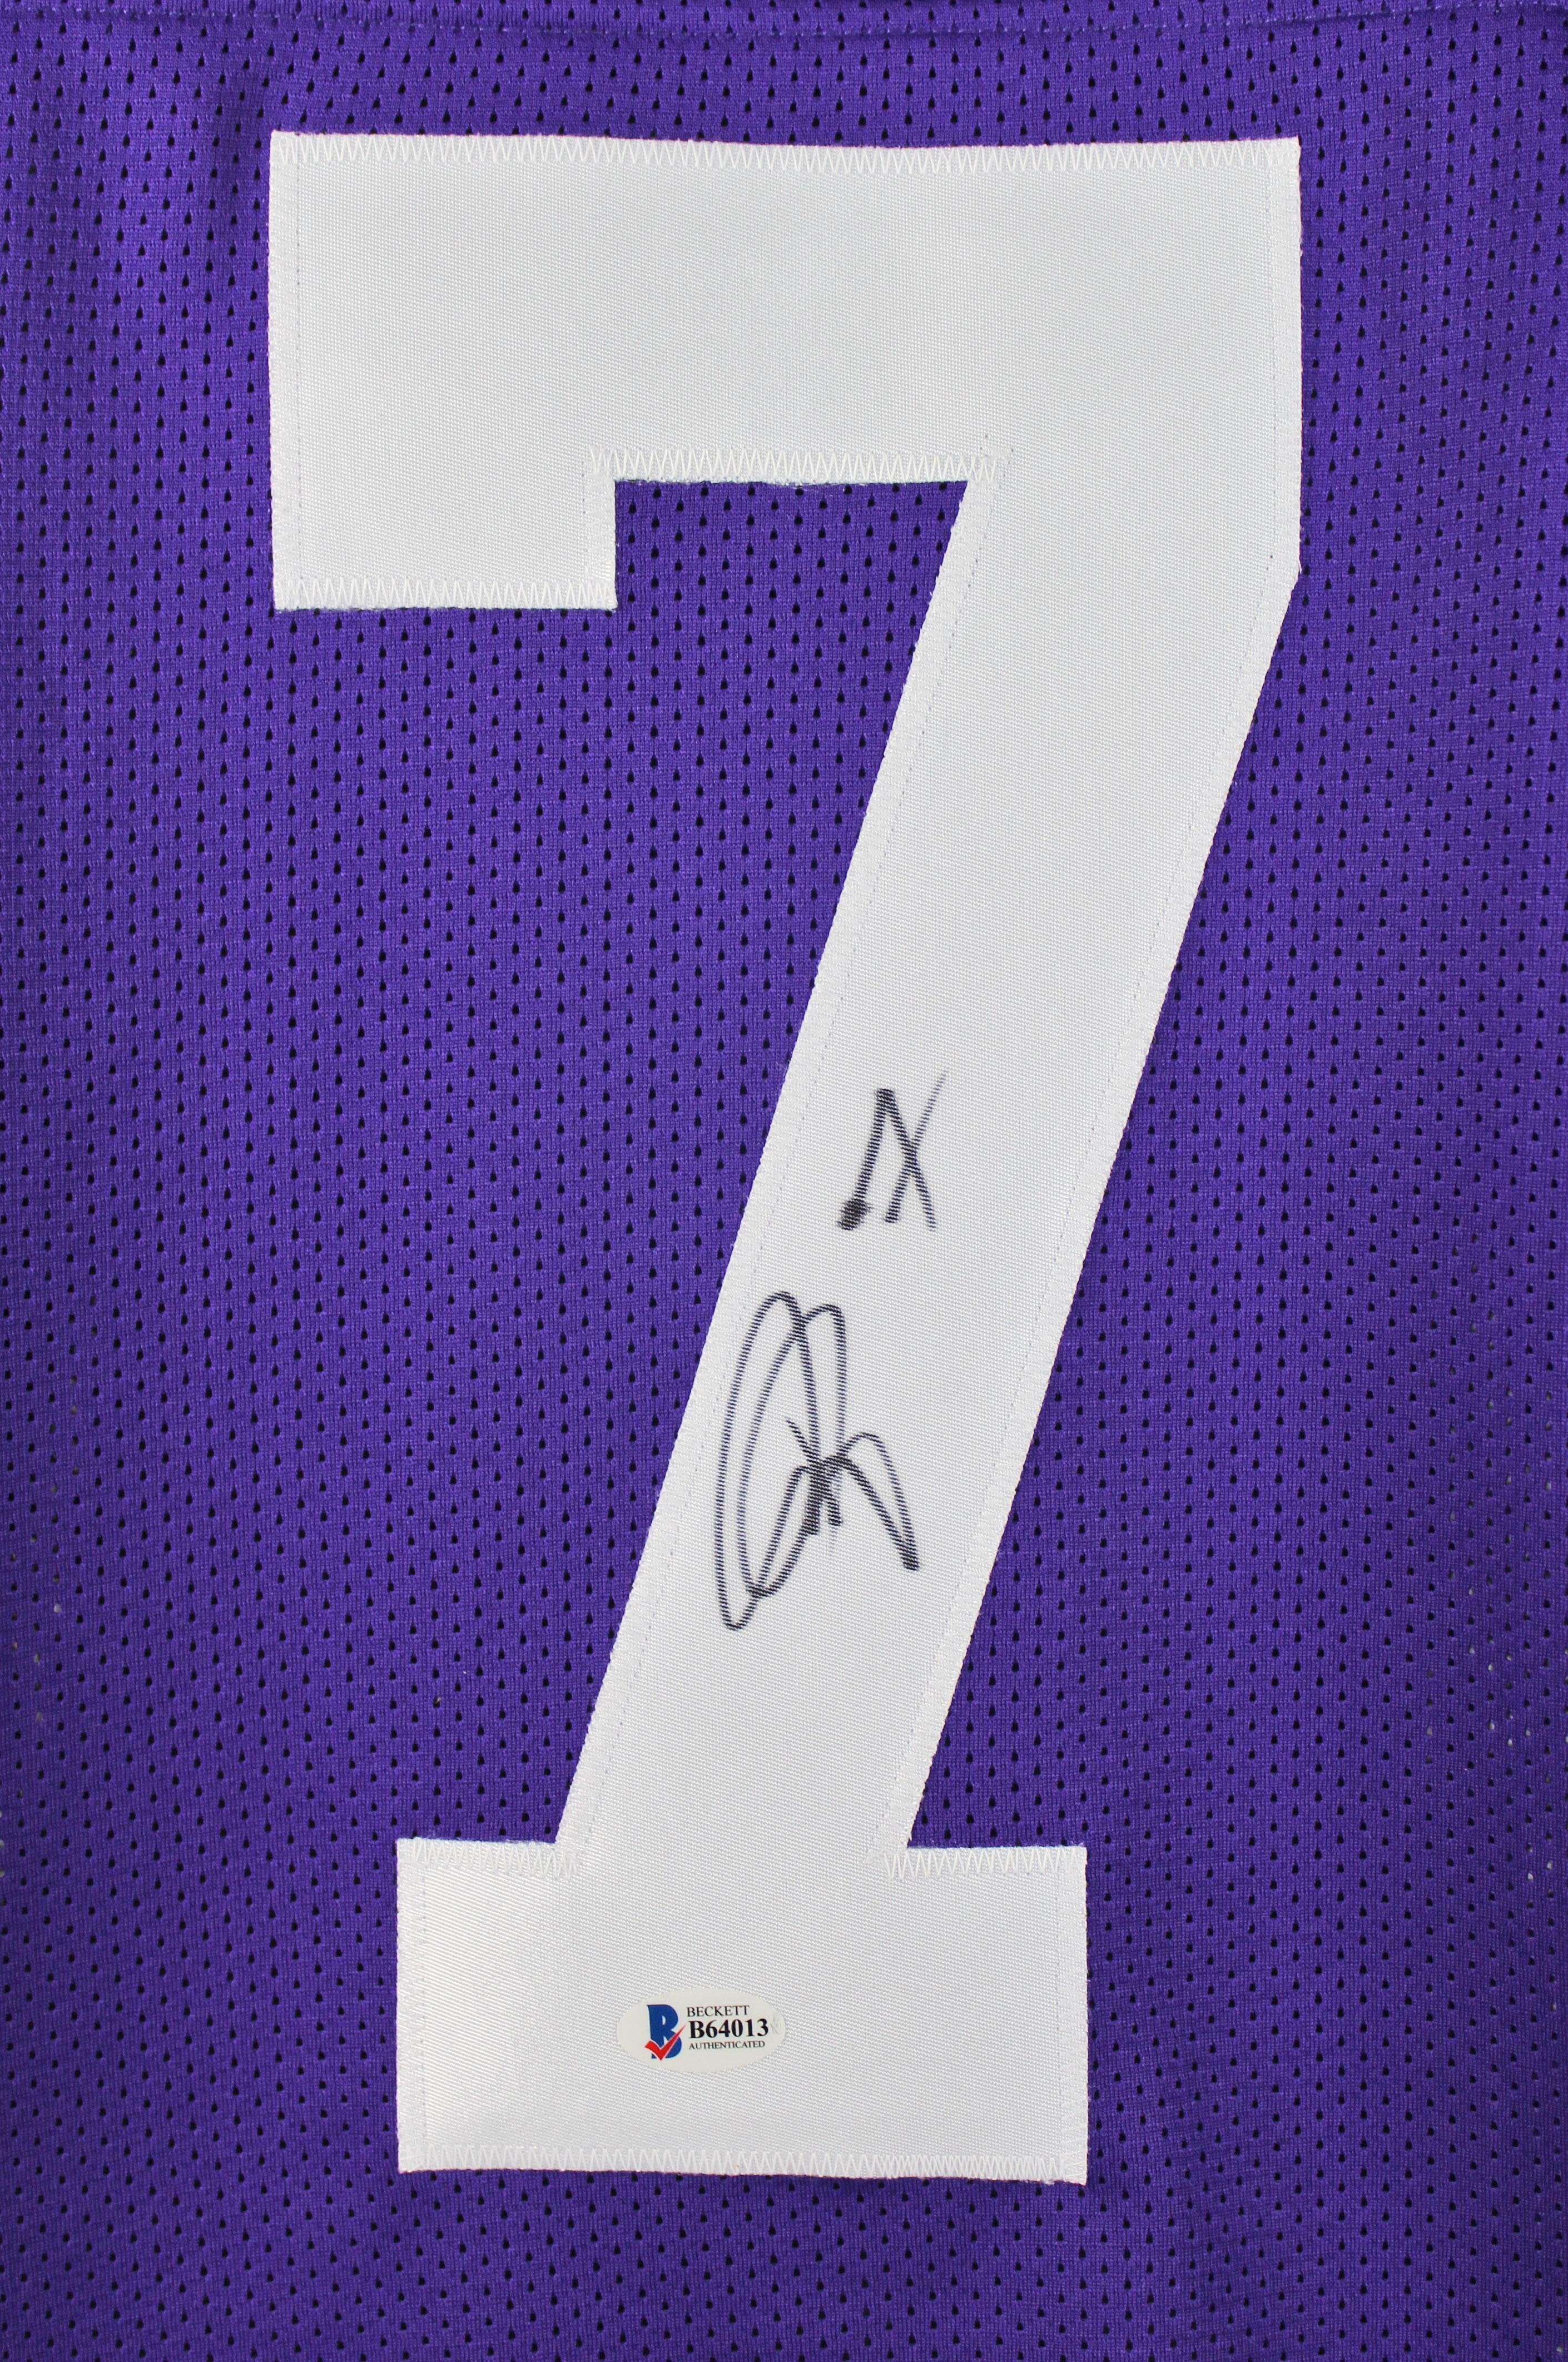 4095e4e14 LSU Patrick Peterson Authentic Signed Purple Jersey BAS  B64013